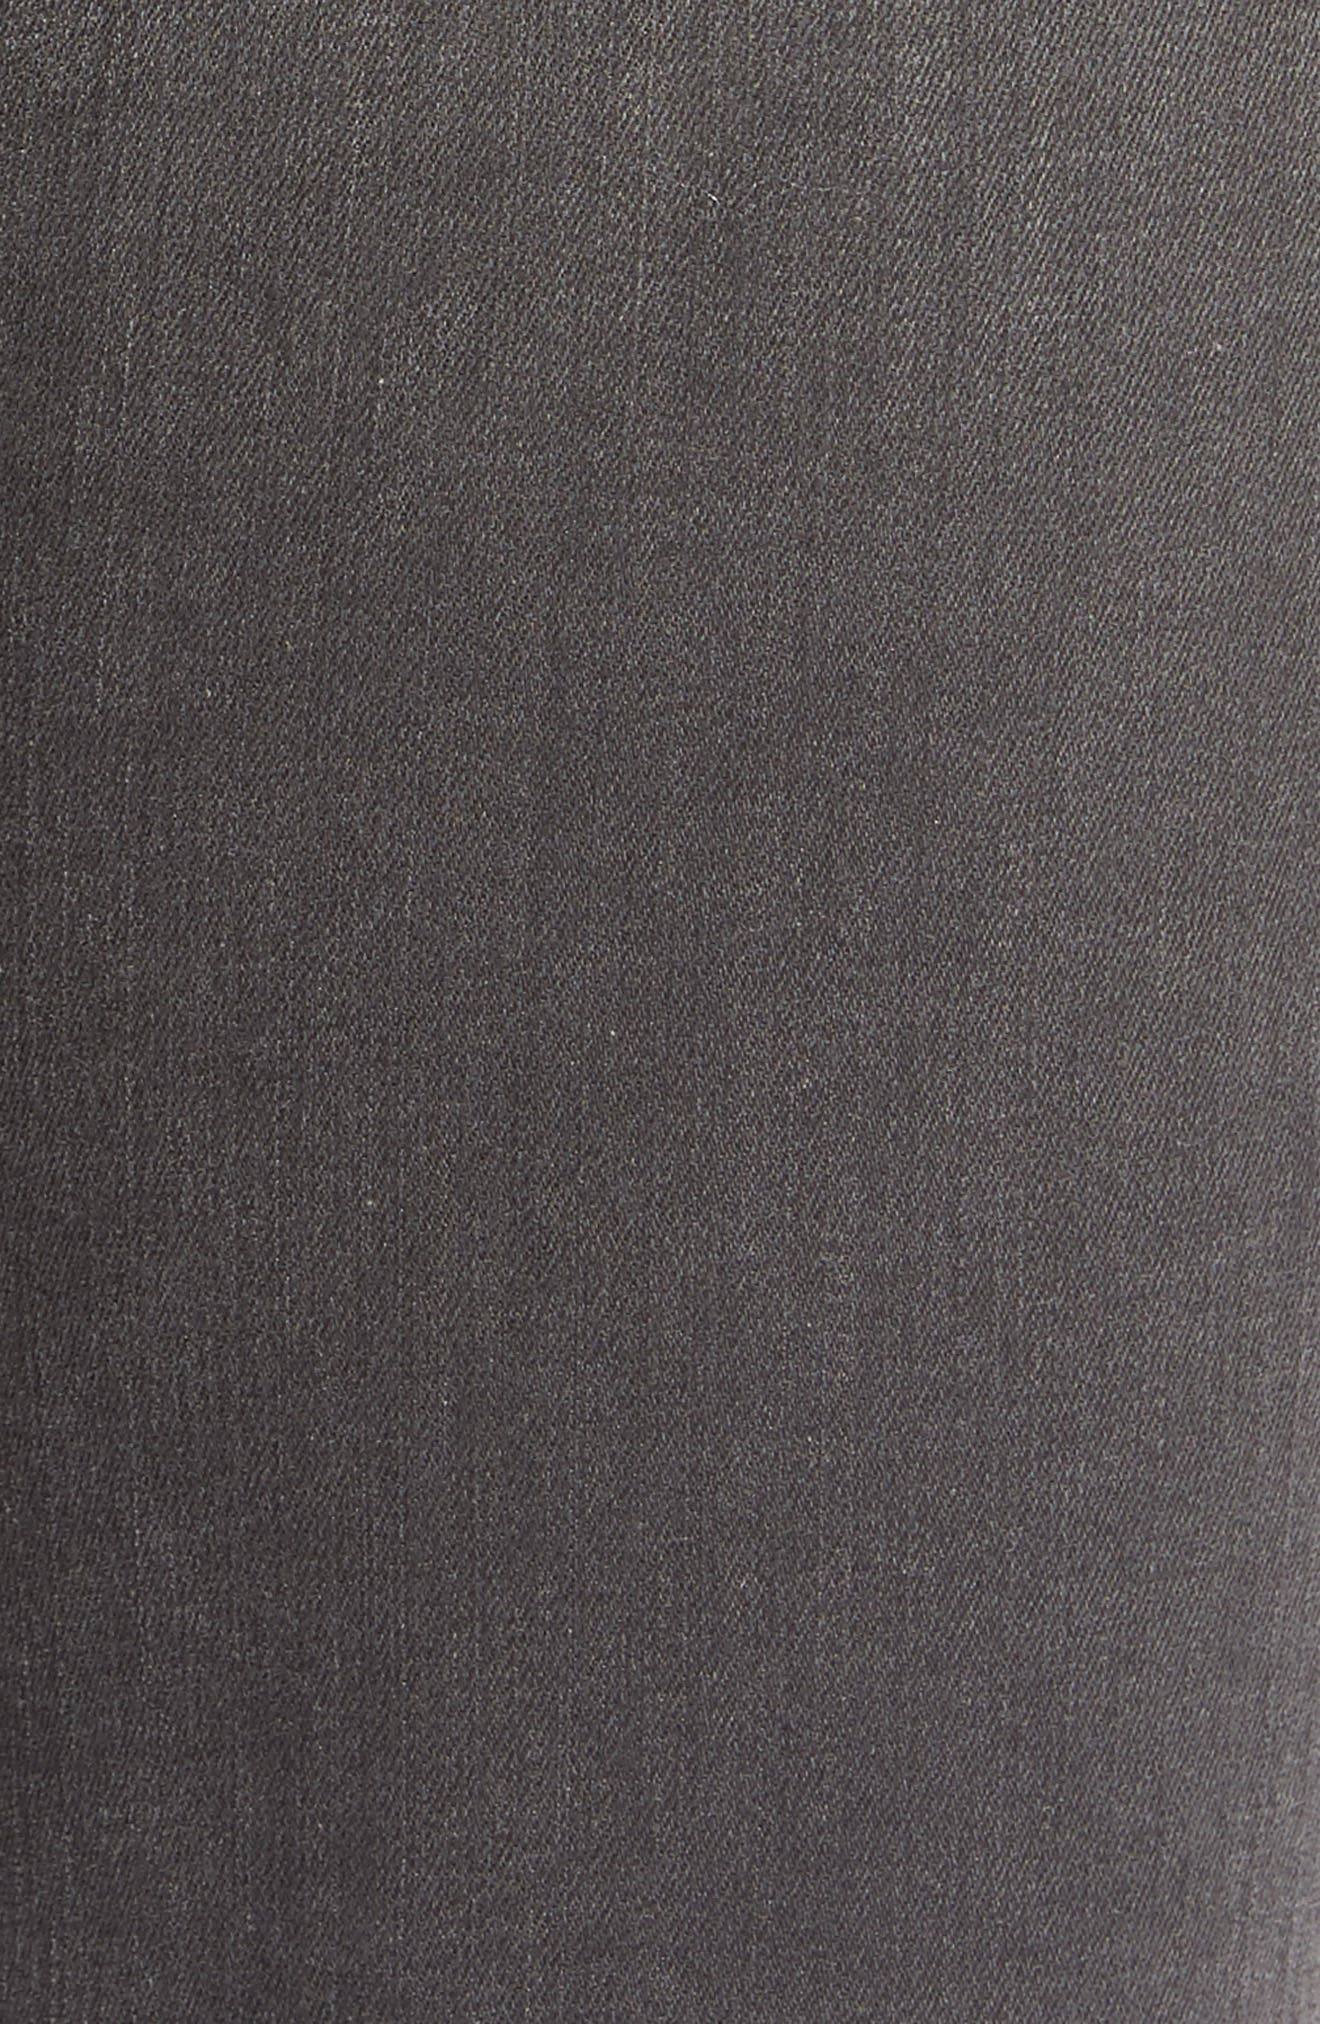 Maria High Waist Skinny Jeans,                             Alternate thumbnail 15, color,